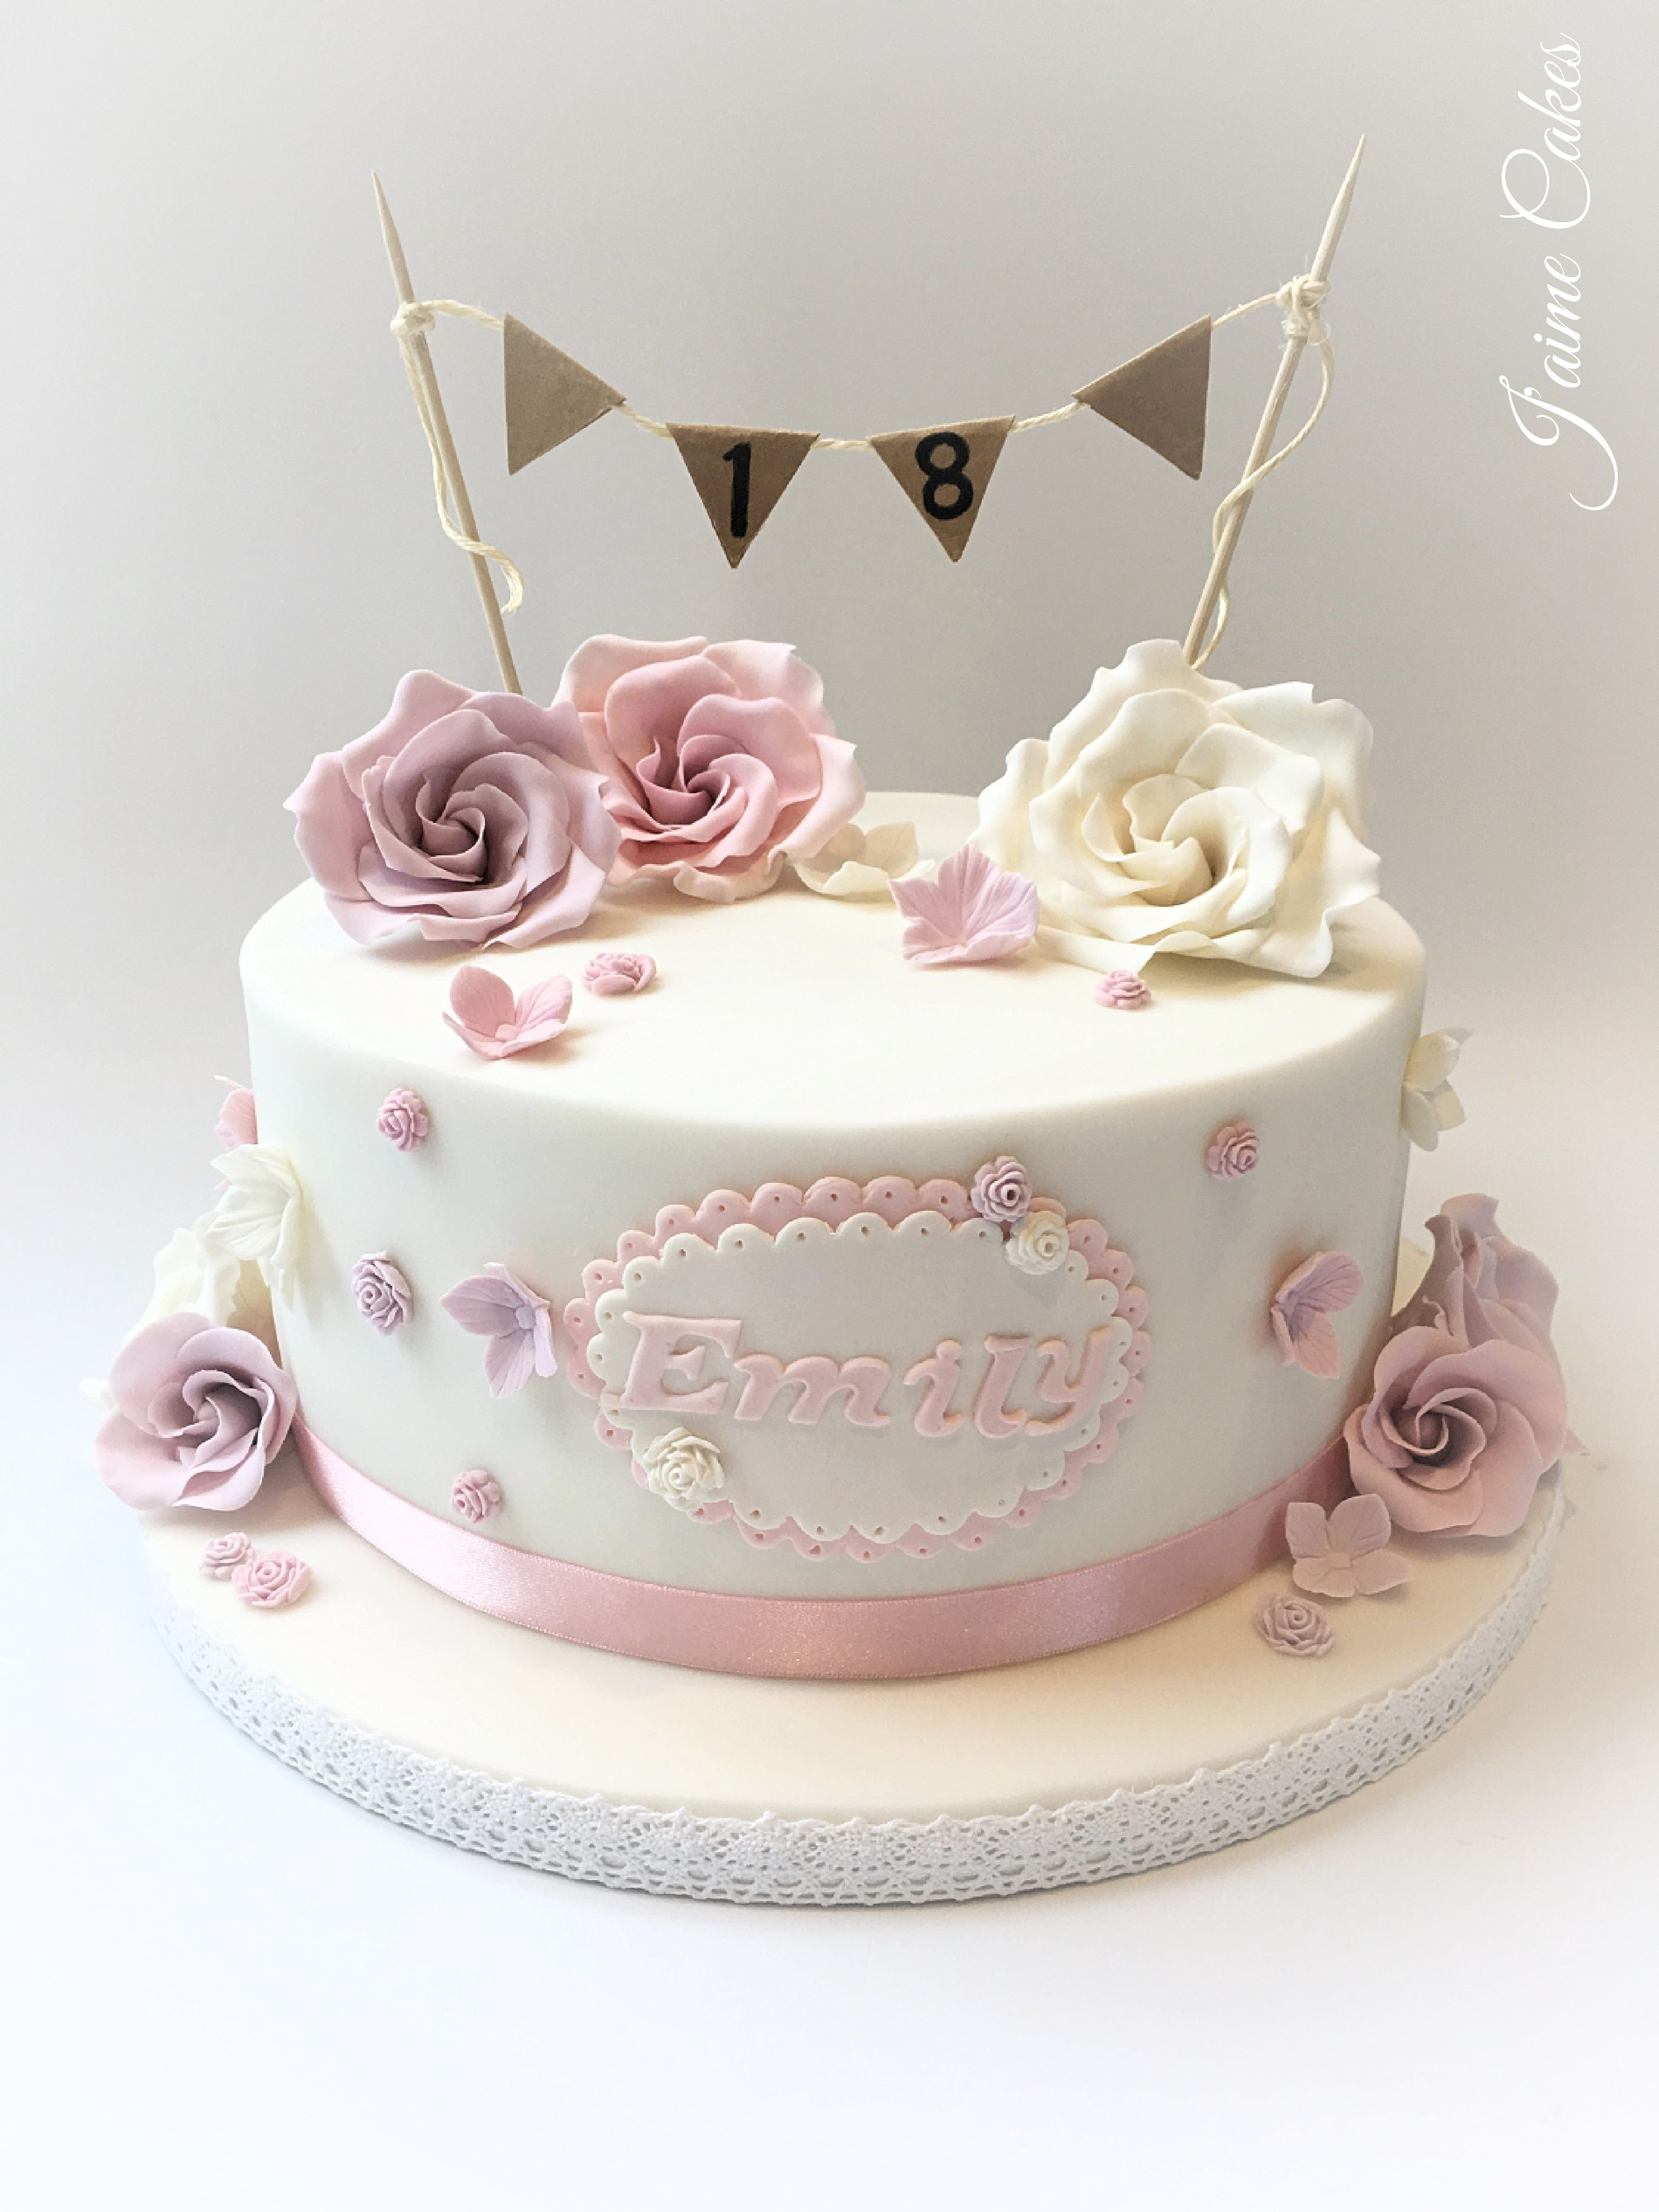 Superb 18Th Birthday Cake Pretty Floral 18Th Birthday Cake Pretty Birthday Cards Printable Opercafe Filternl